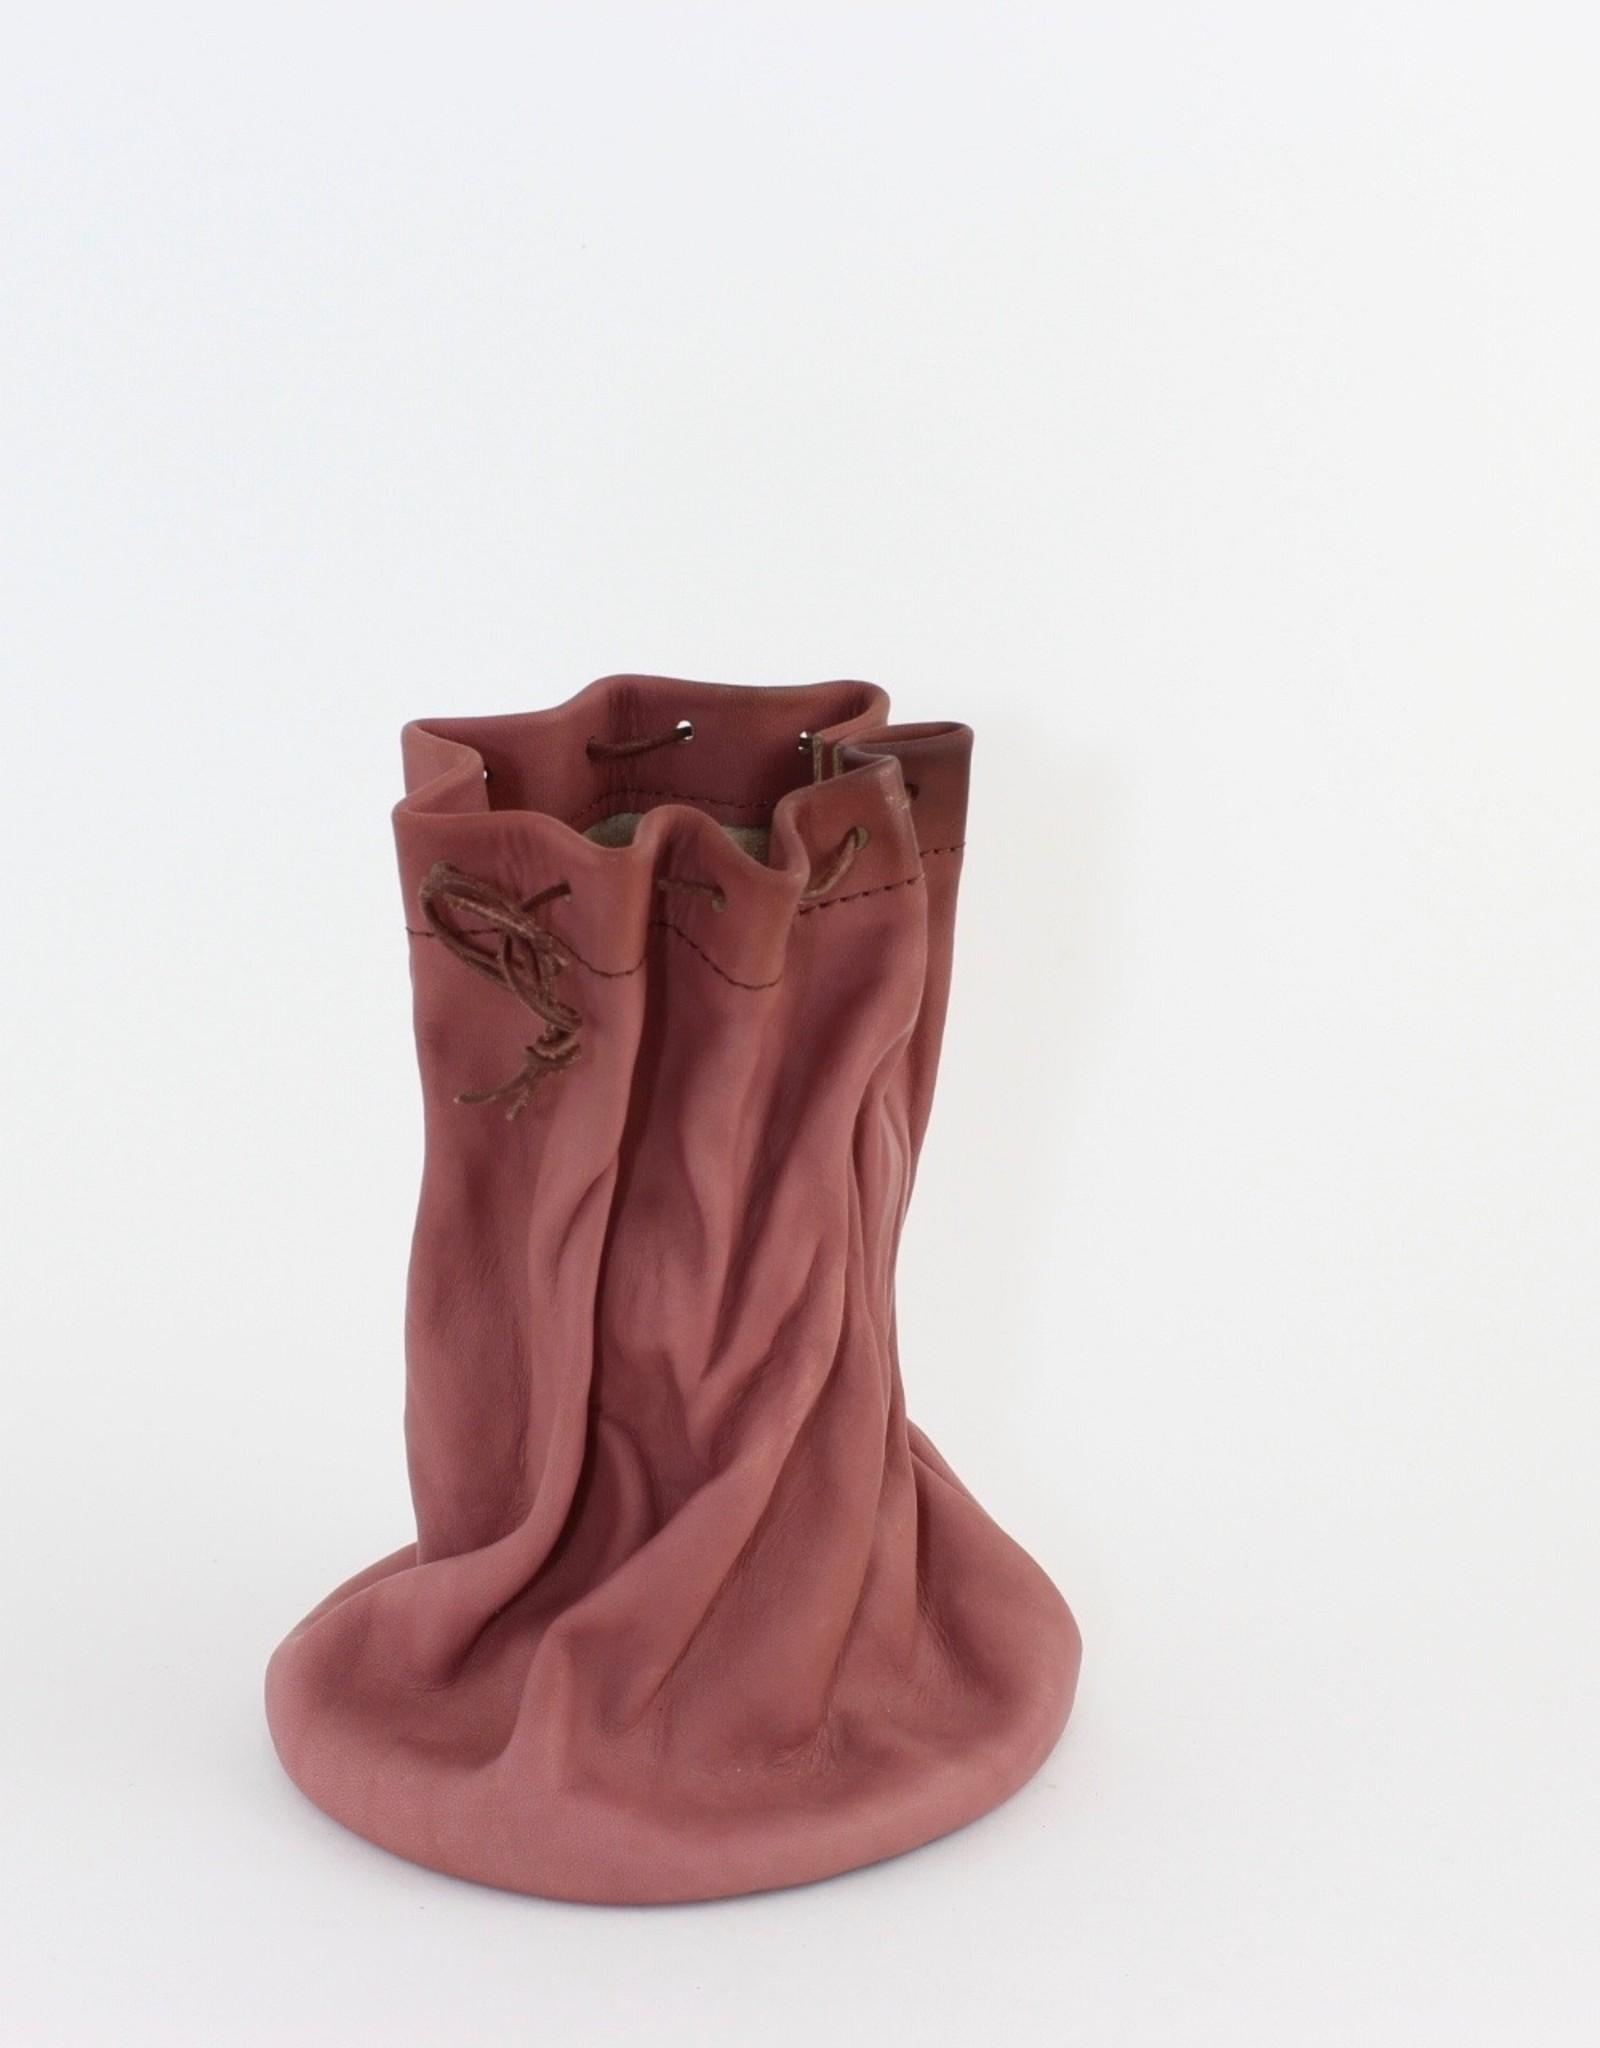 Jolene Dauphney Flower Vase by Leather Works